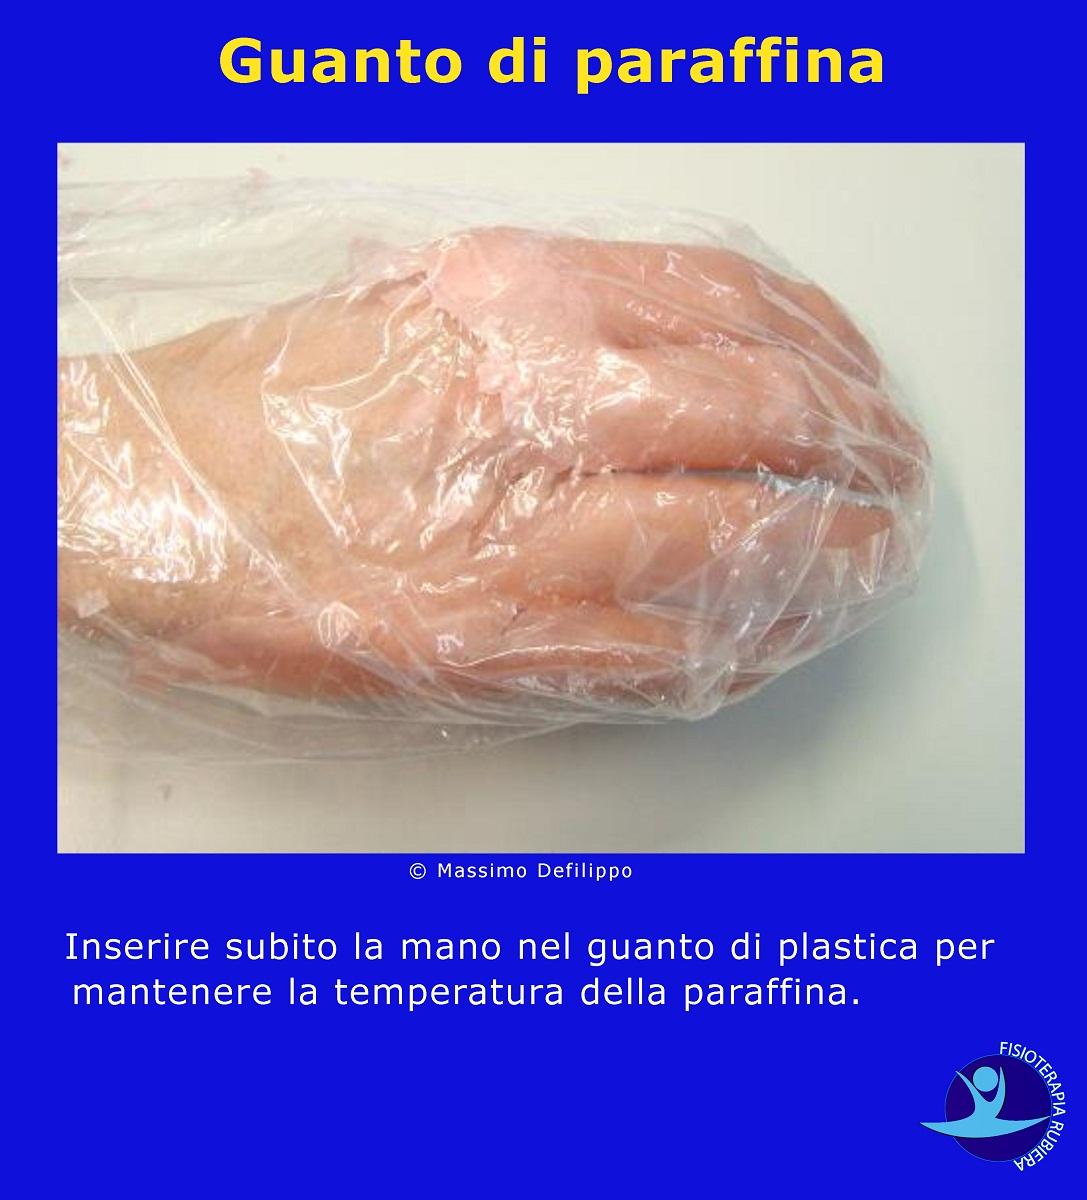 Guanto-di-paraffina